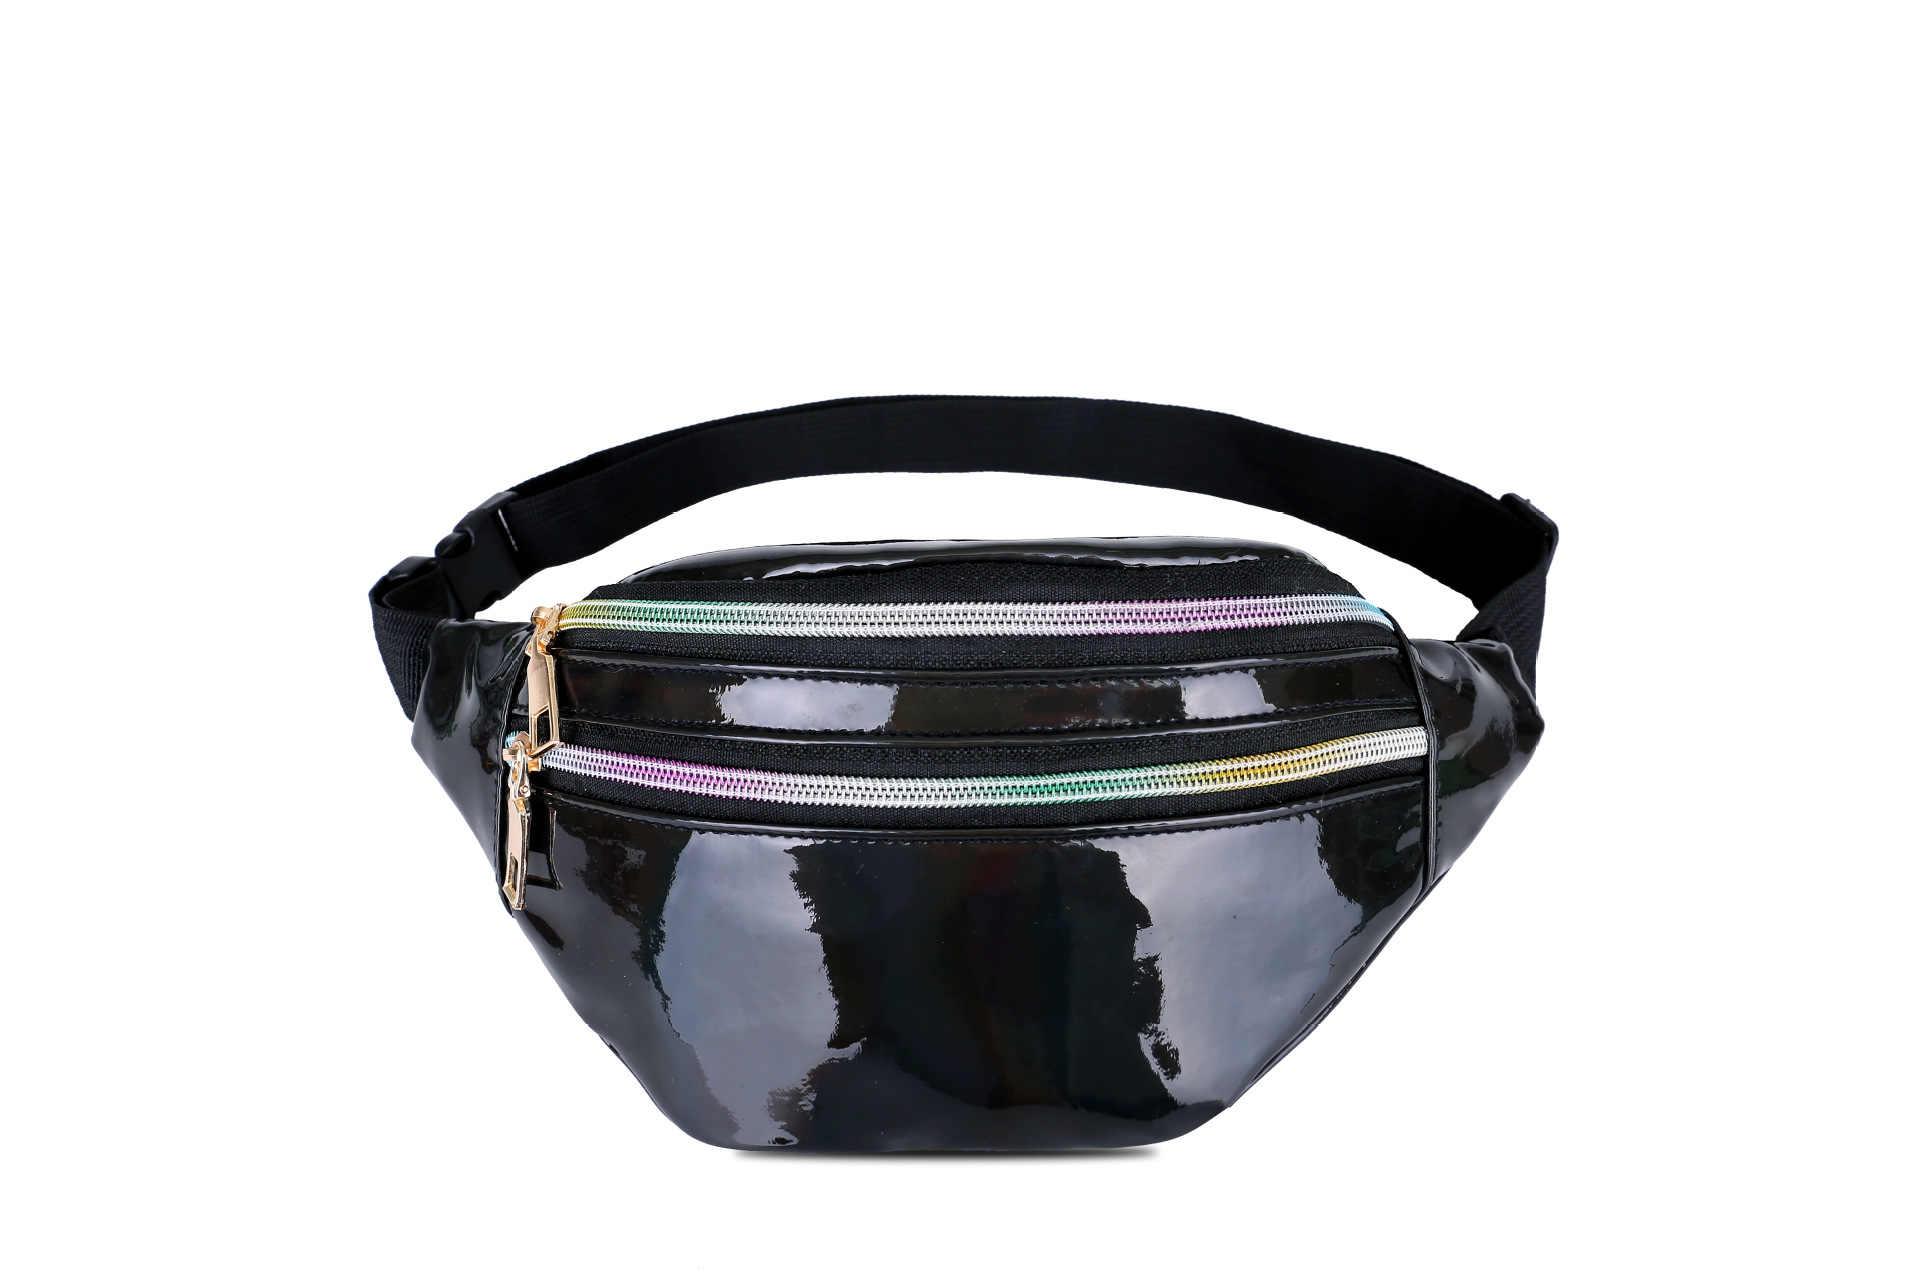 Baru Pria dan Wanita Laser Pinggang Fashion Terang Dada Tas Multi Fungsi Warna Bahu Crossbody Tas Olahraga Luar Ruangan pinggang Pack